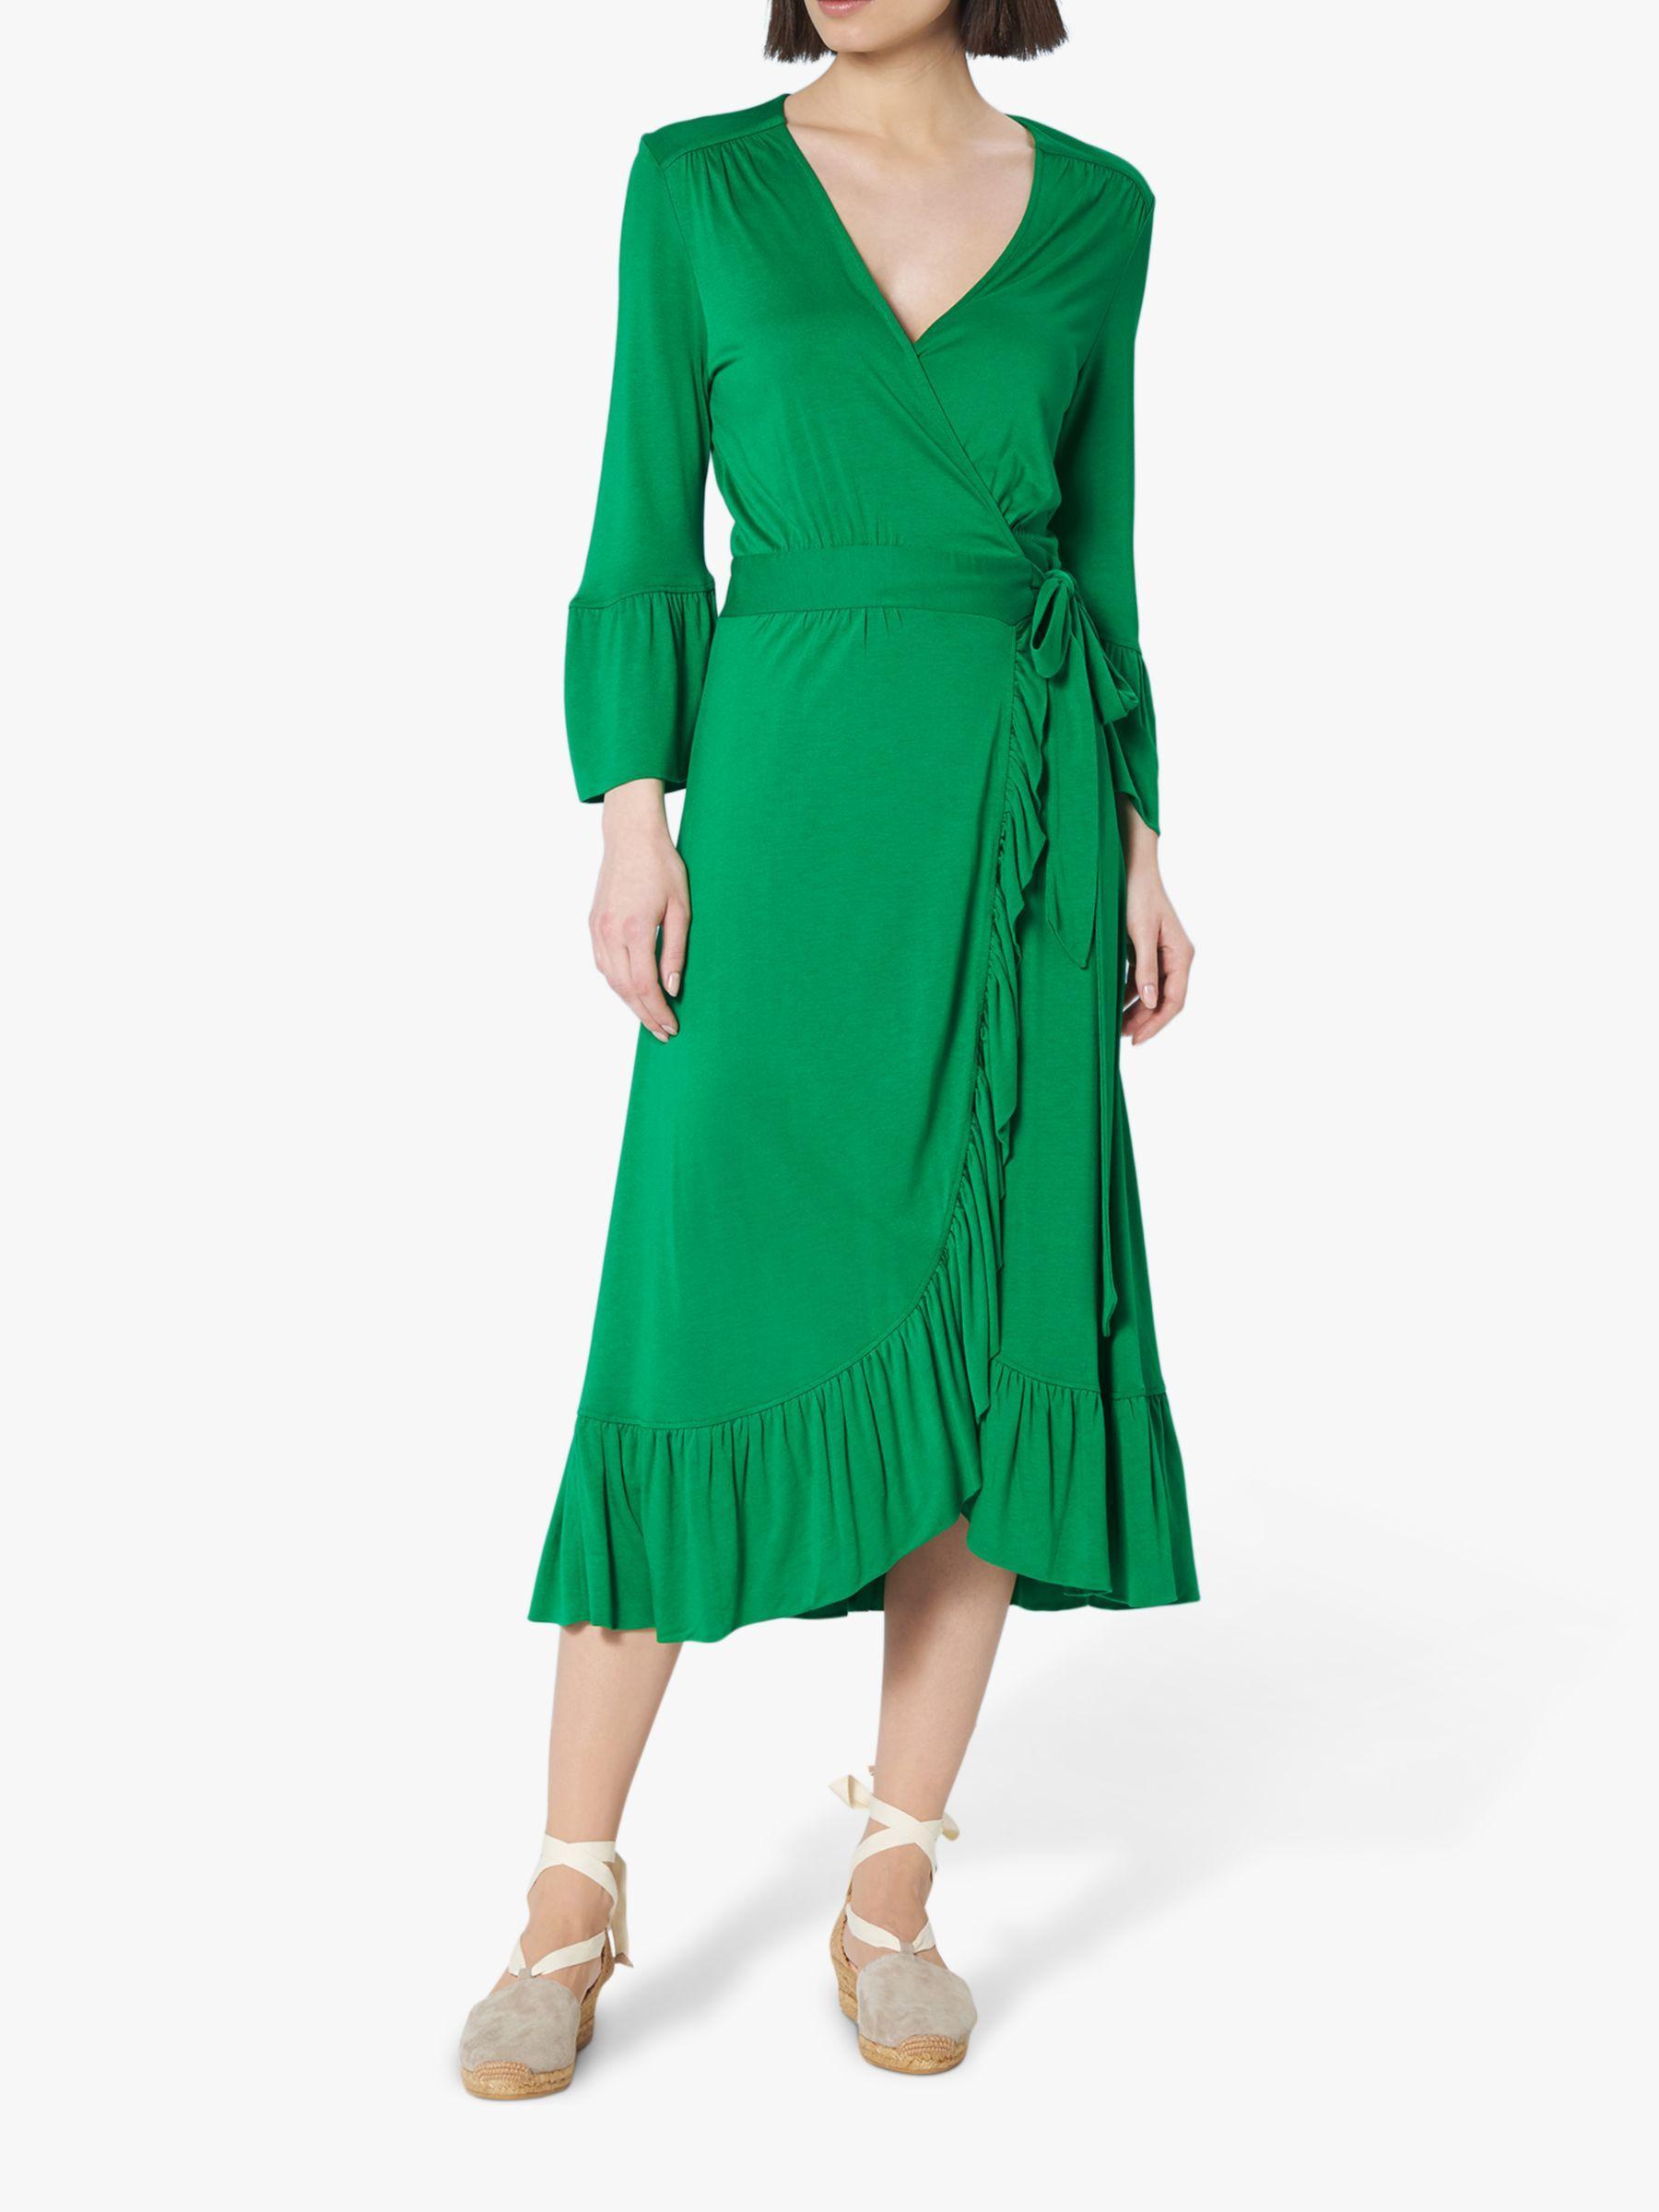 L K Bennett Synthetic Vika Dress In Green Lyst